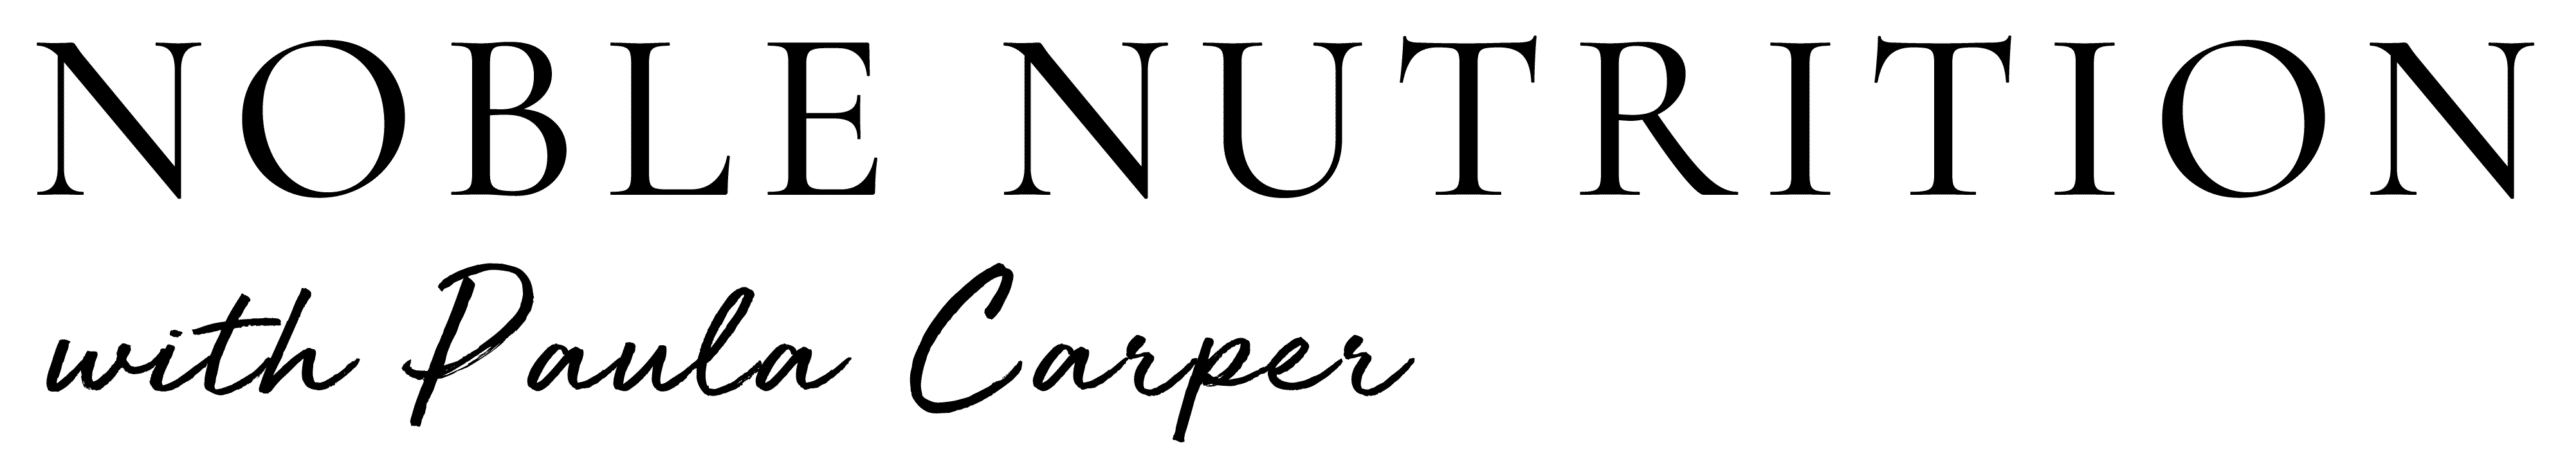 noble nutrition logo